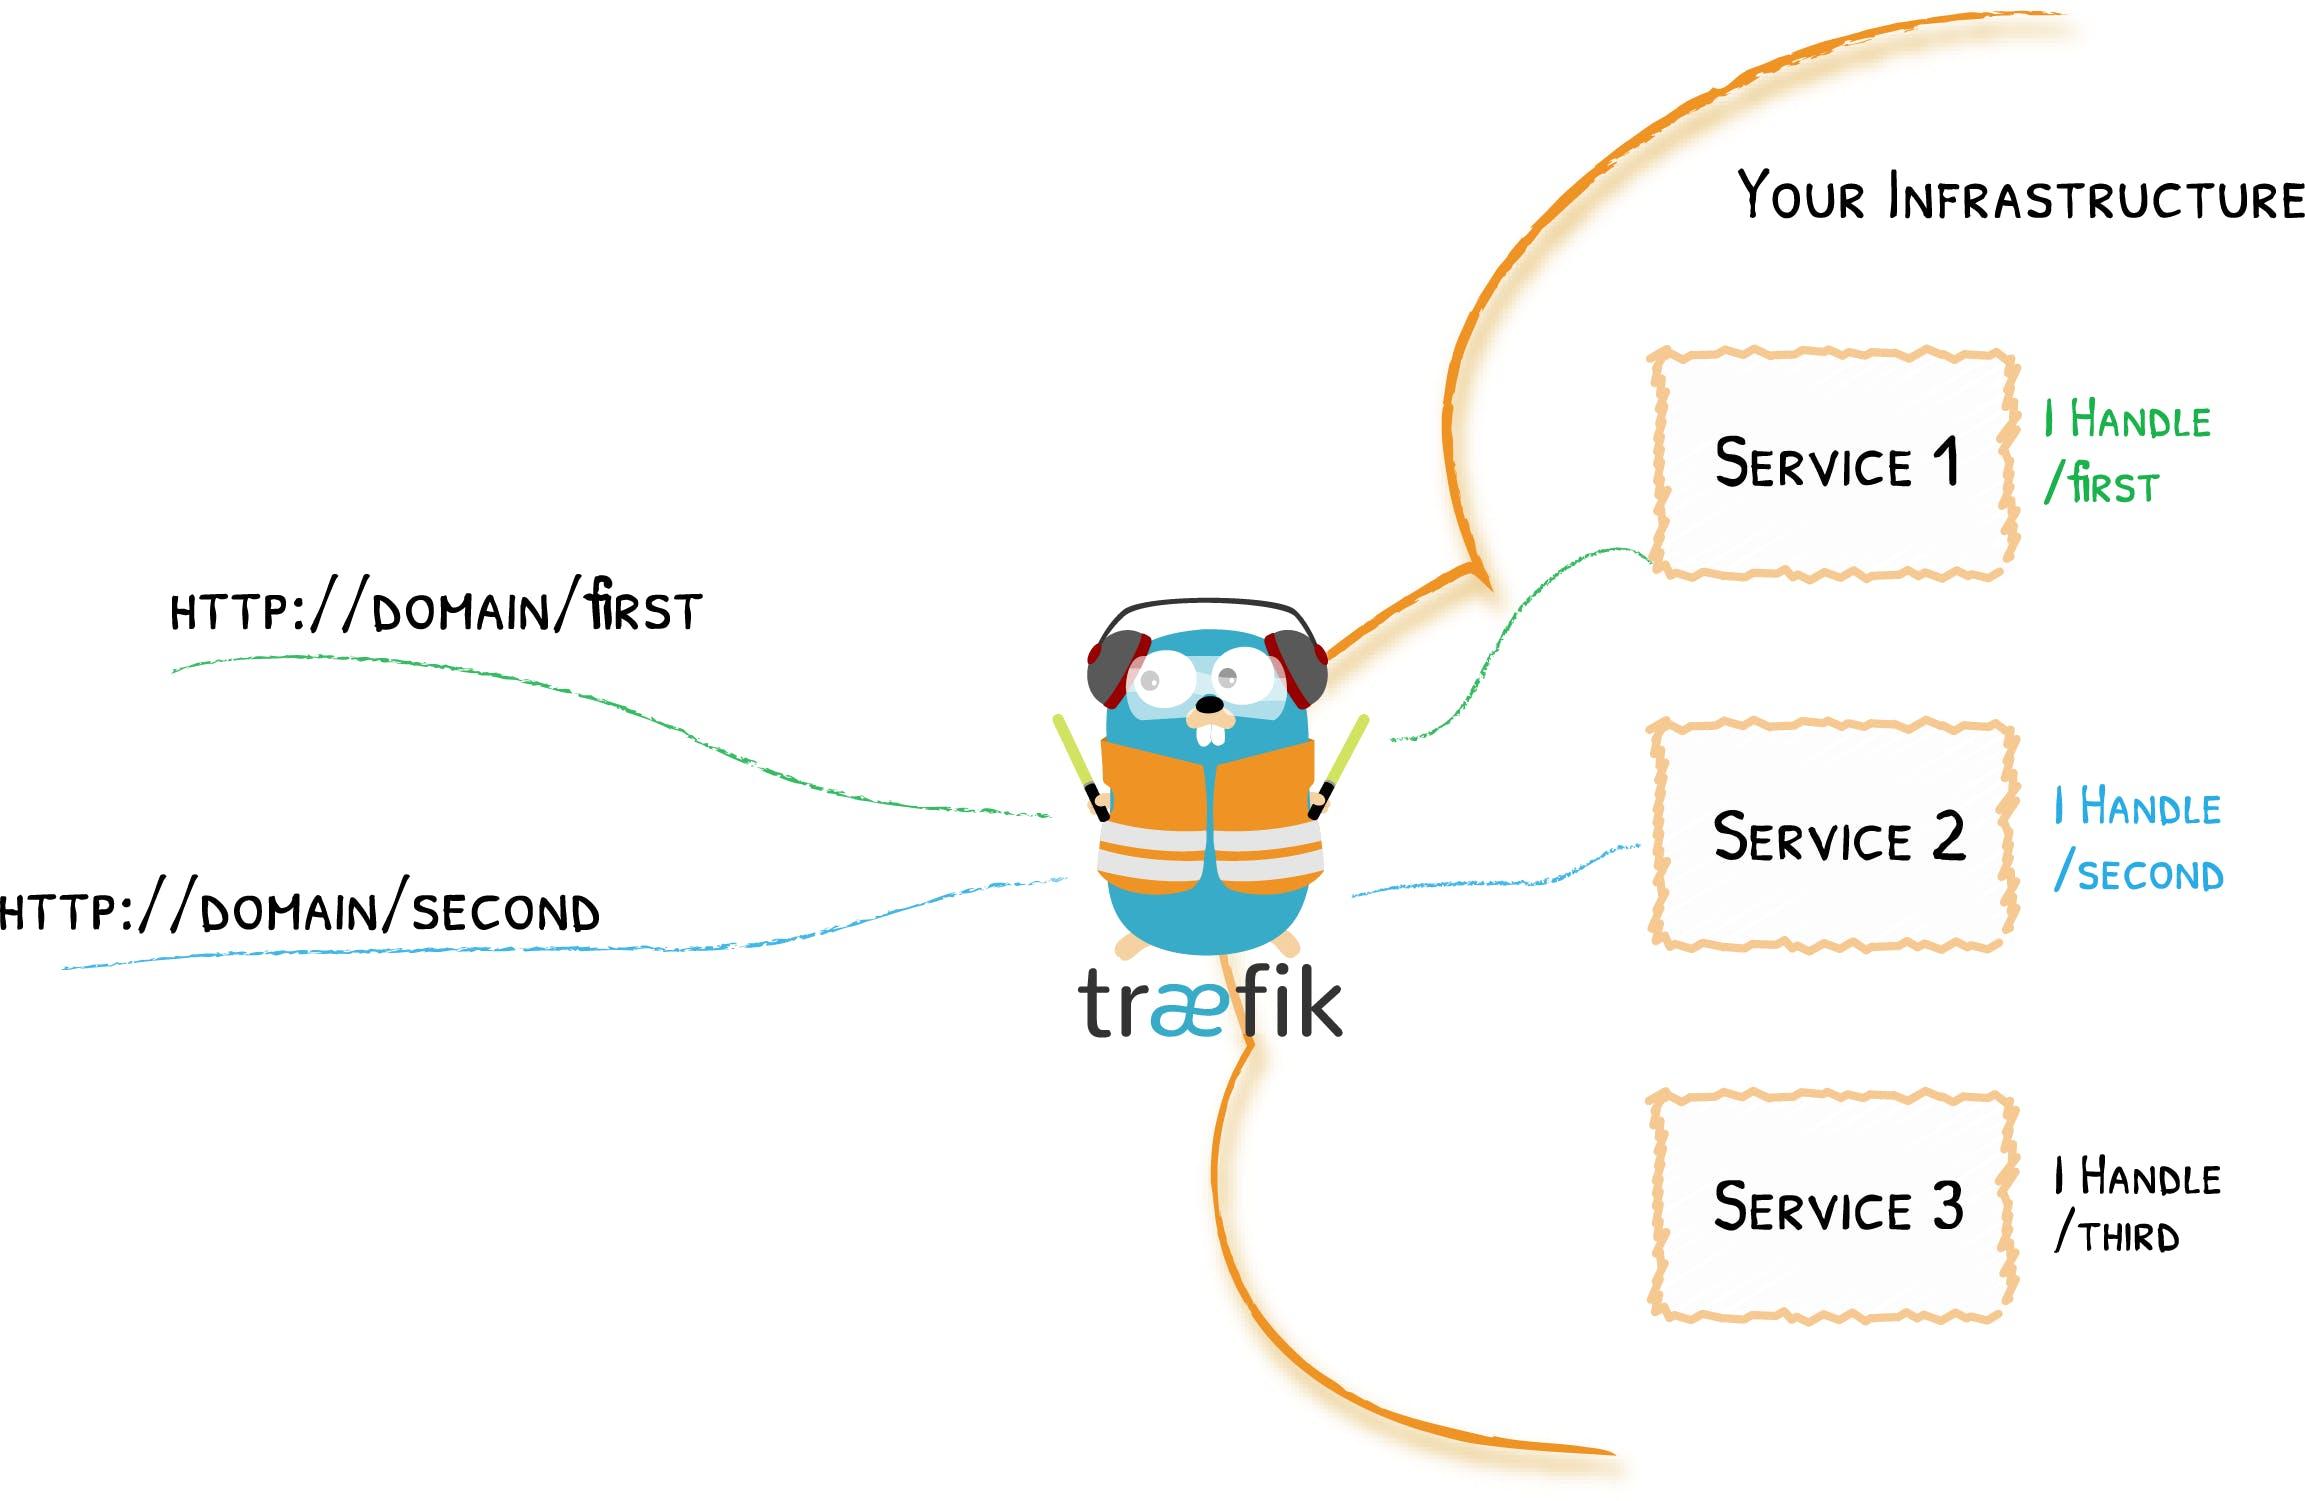 traefik-concepts-2.png